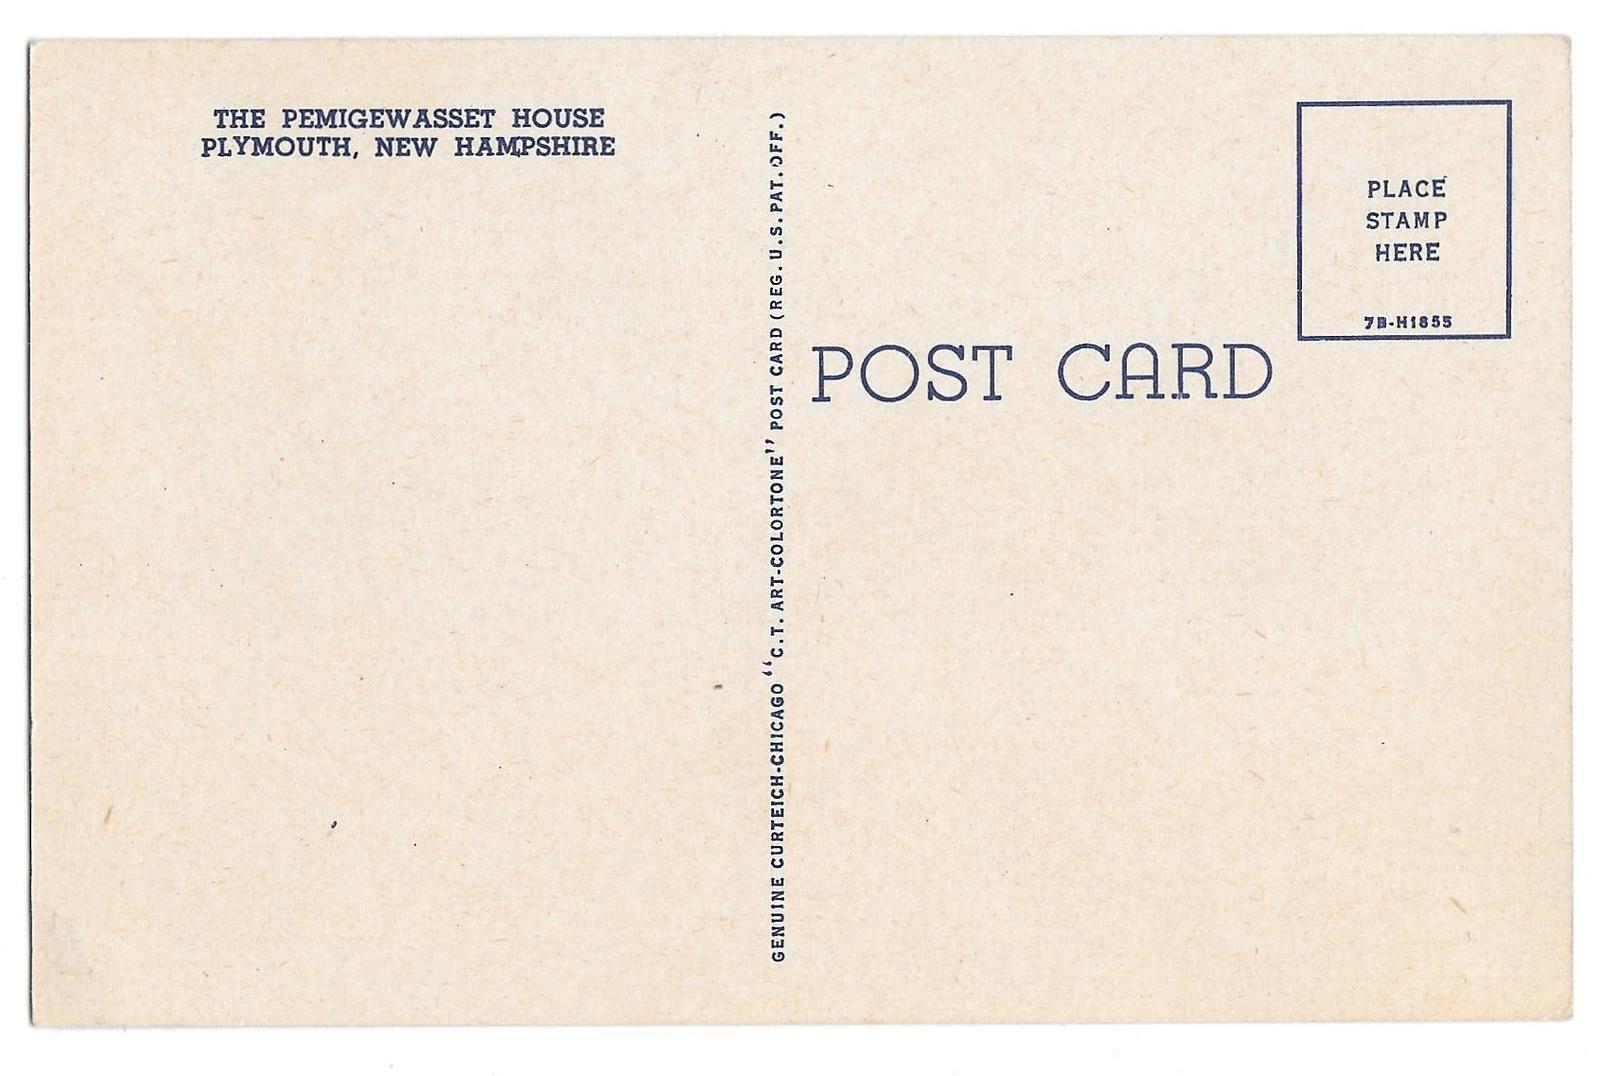 Pemigewasset House Vintage Plymouth NH Hotel Linen Postcard Curteich